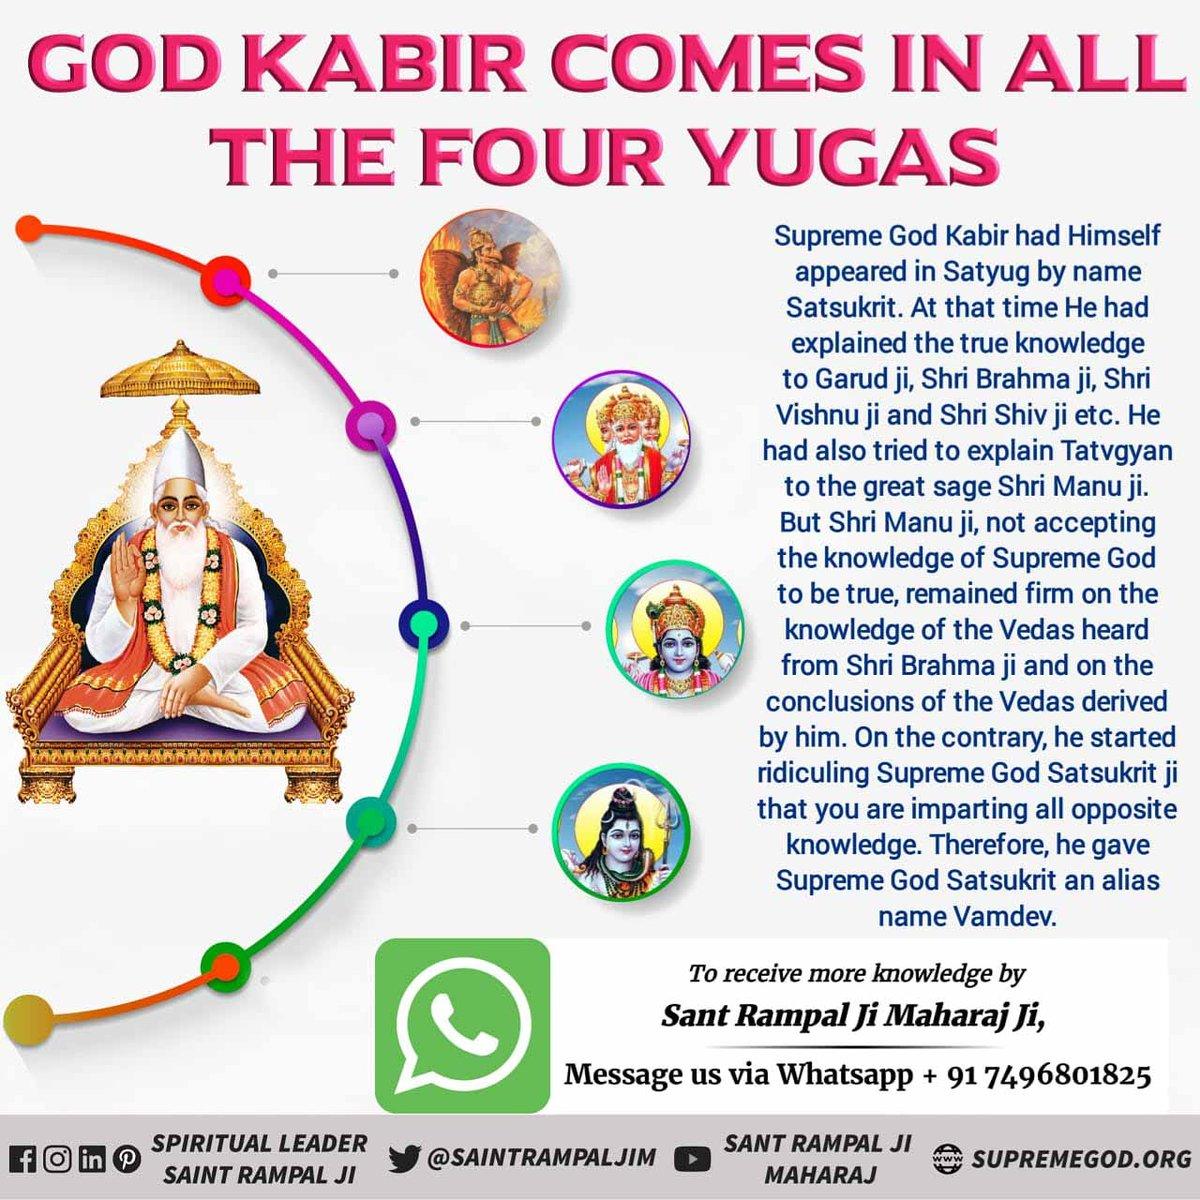 #SundayThoughts  GoD KABIR Comes lN ALL The FoUR Yugas  #SupremeGodKabir अधिक जानकारी के लिए Sant Rampal Ji Maharaj Youtube Channel पर Visit करें।